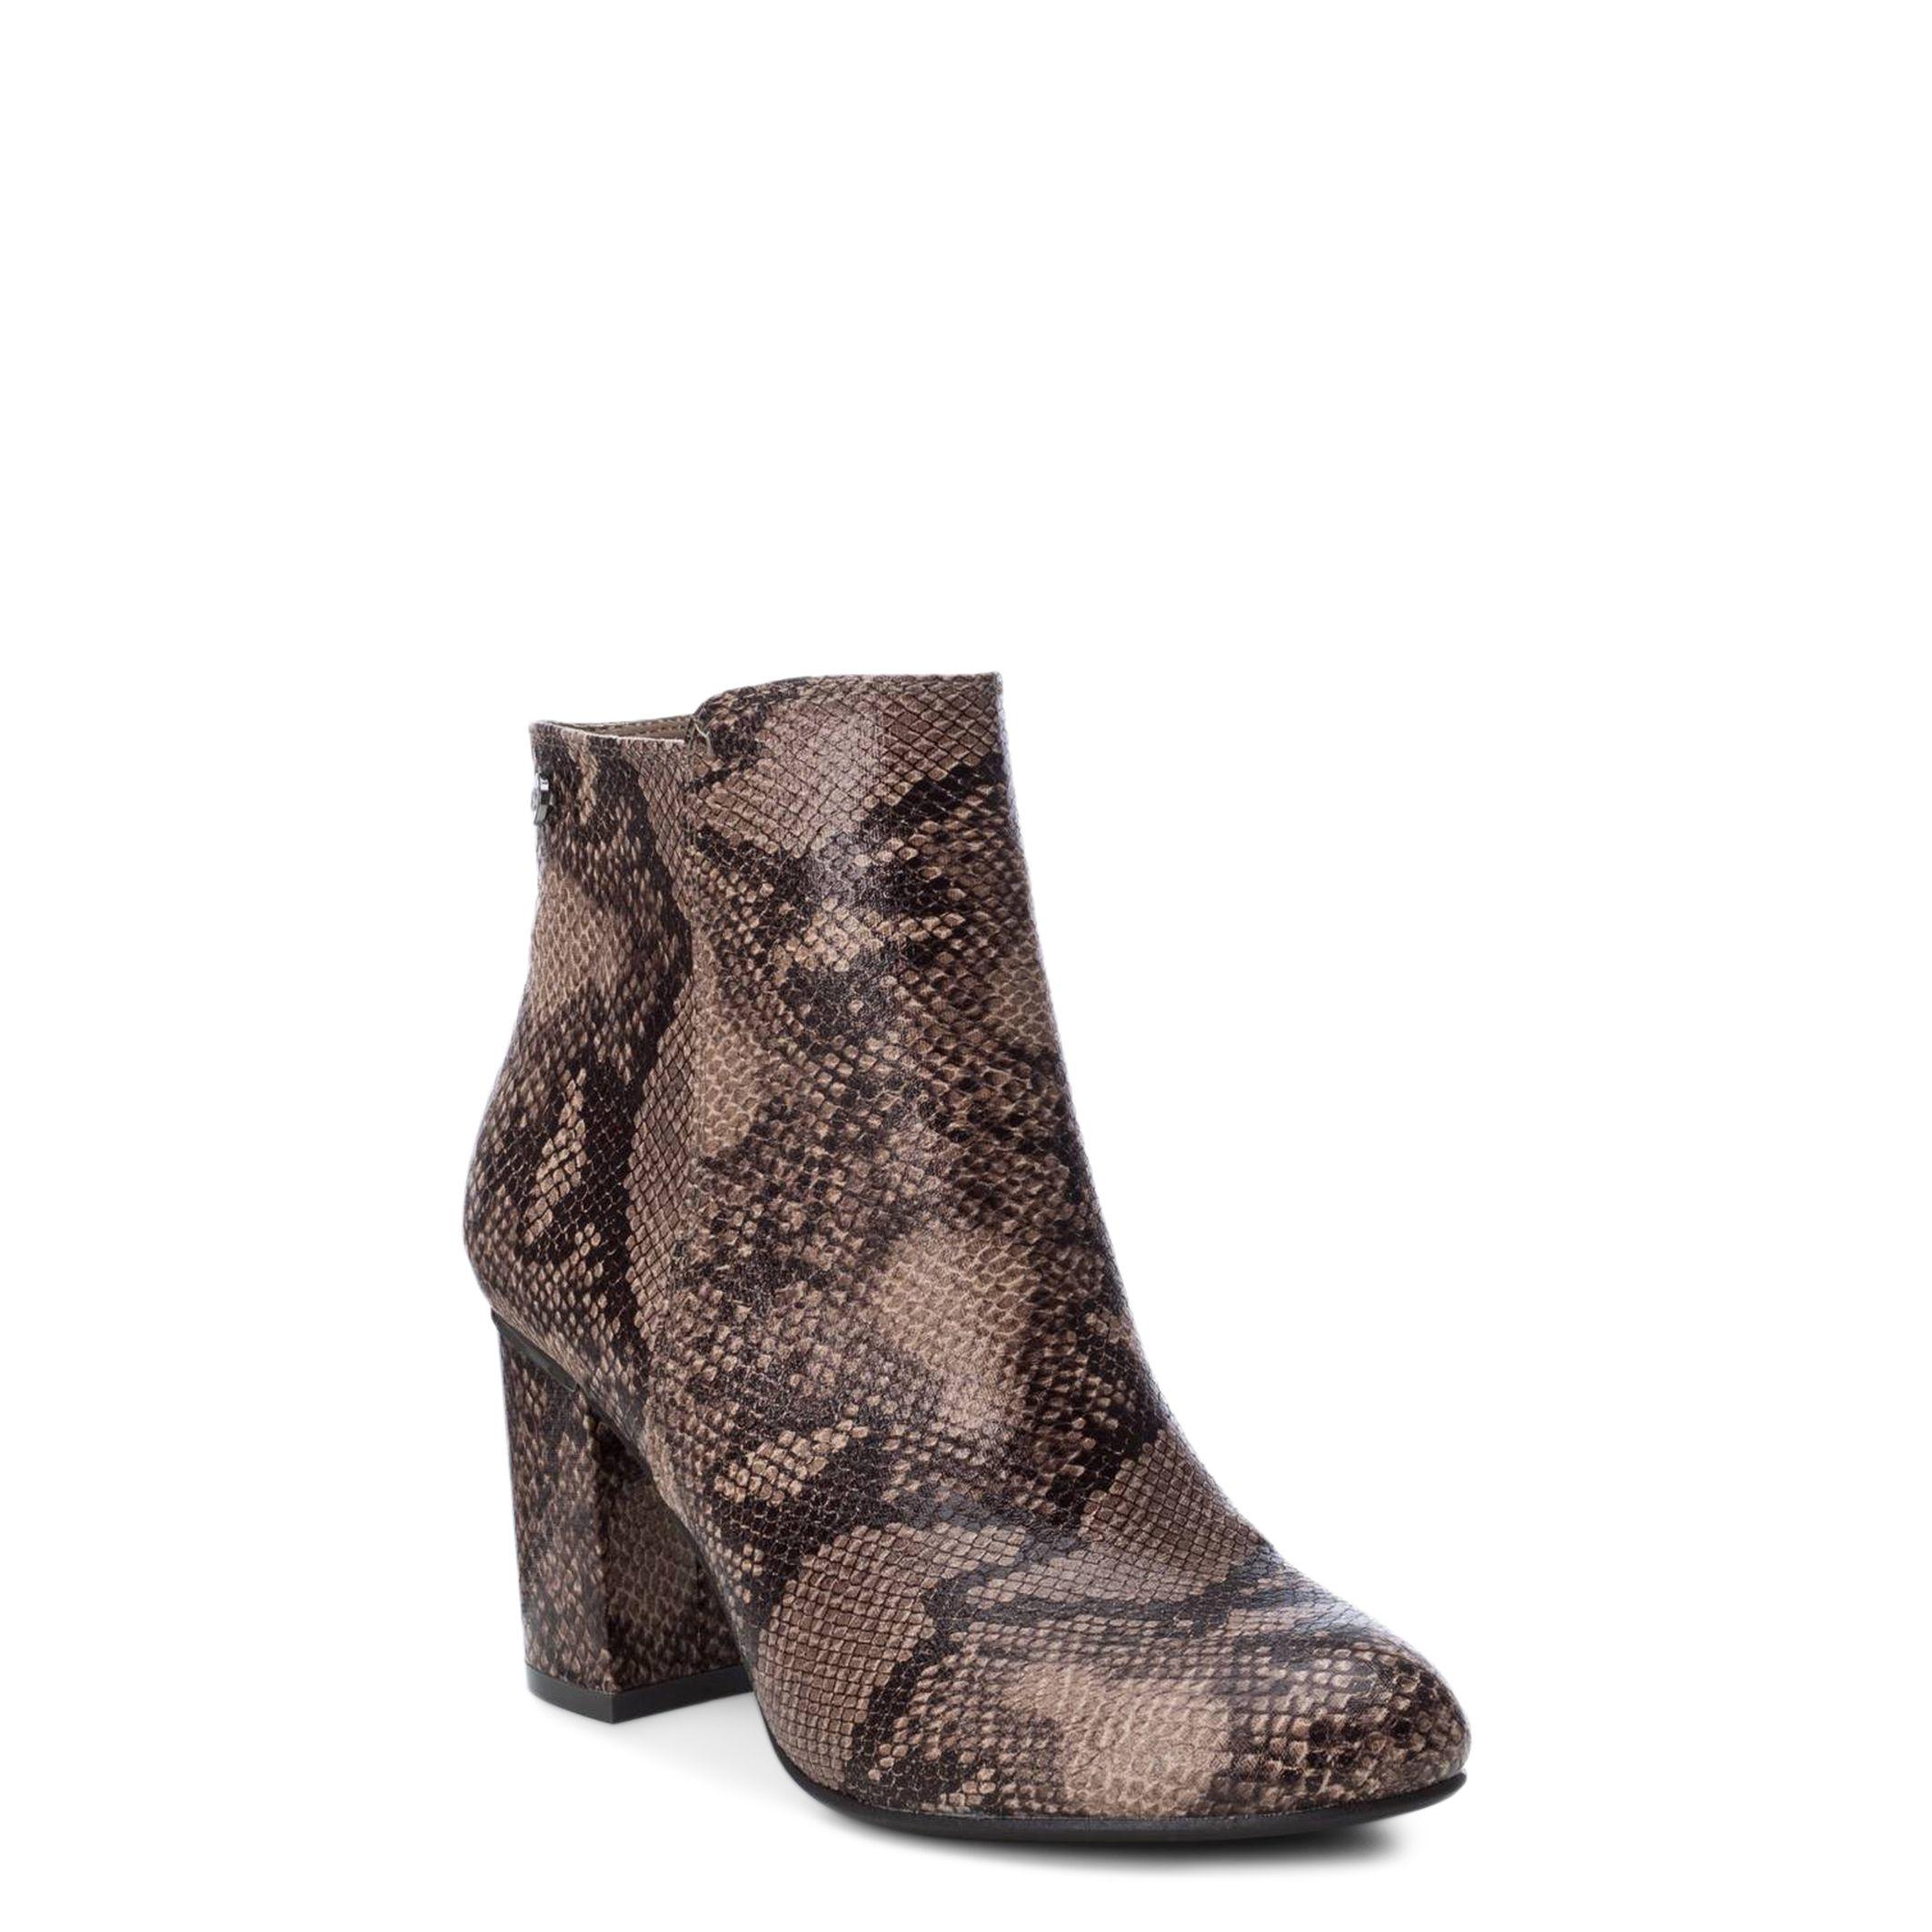 Schuhe Xti – 35160 – Braun